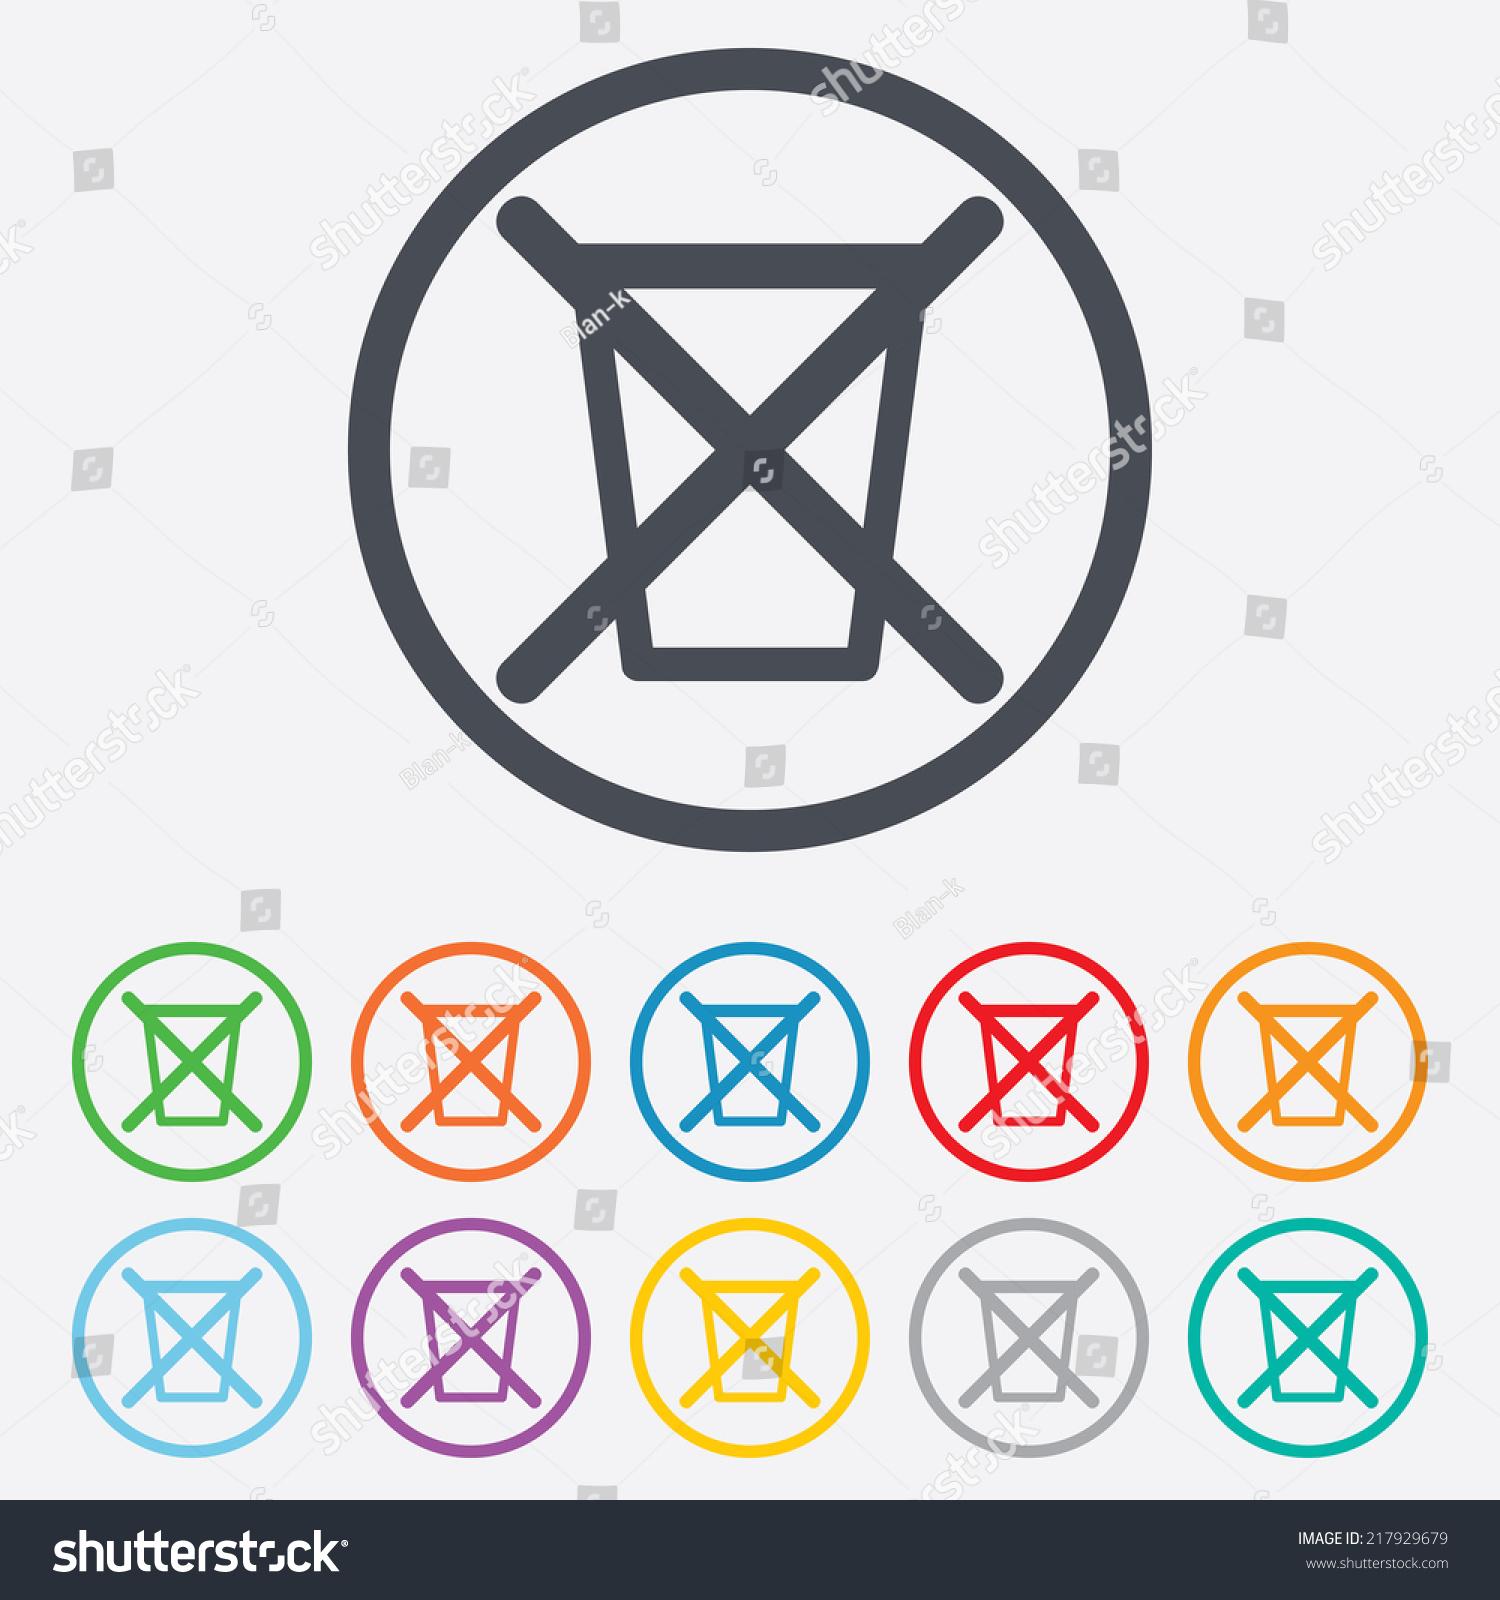 Do Not Throw Trash Recycle Bin Stock Illustration 217929679